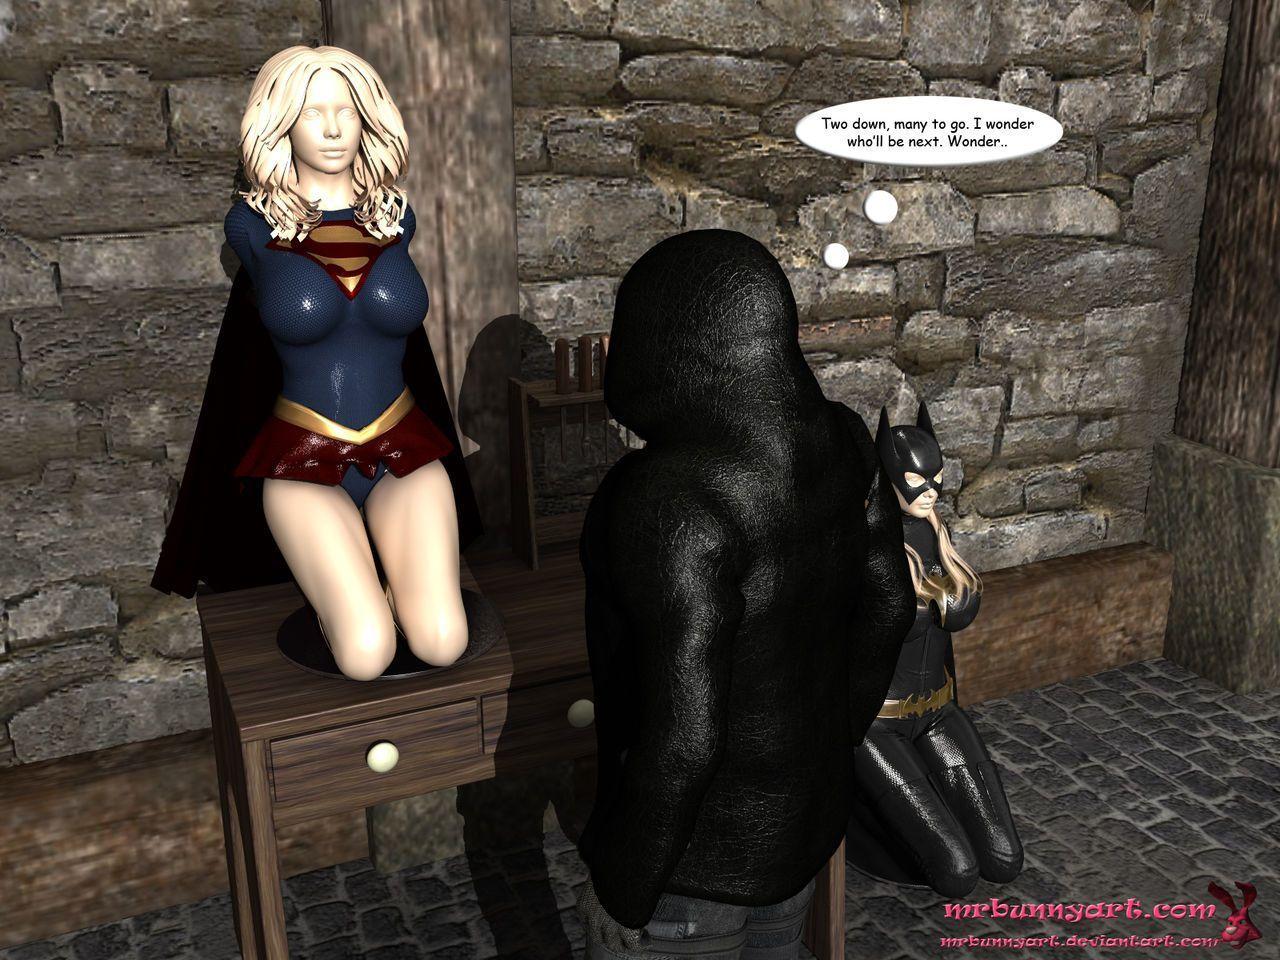 [MrBunnyArt] supergirl vs cain (supergirl) [English] - part 3